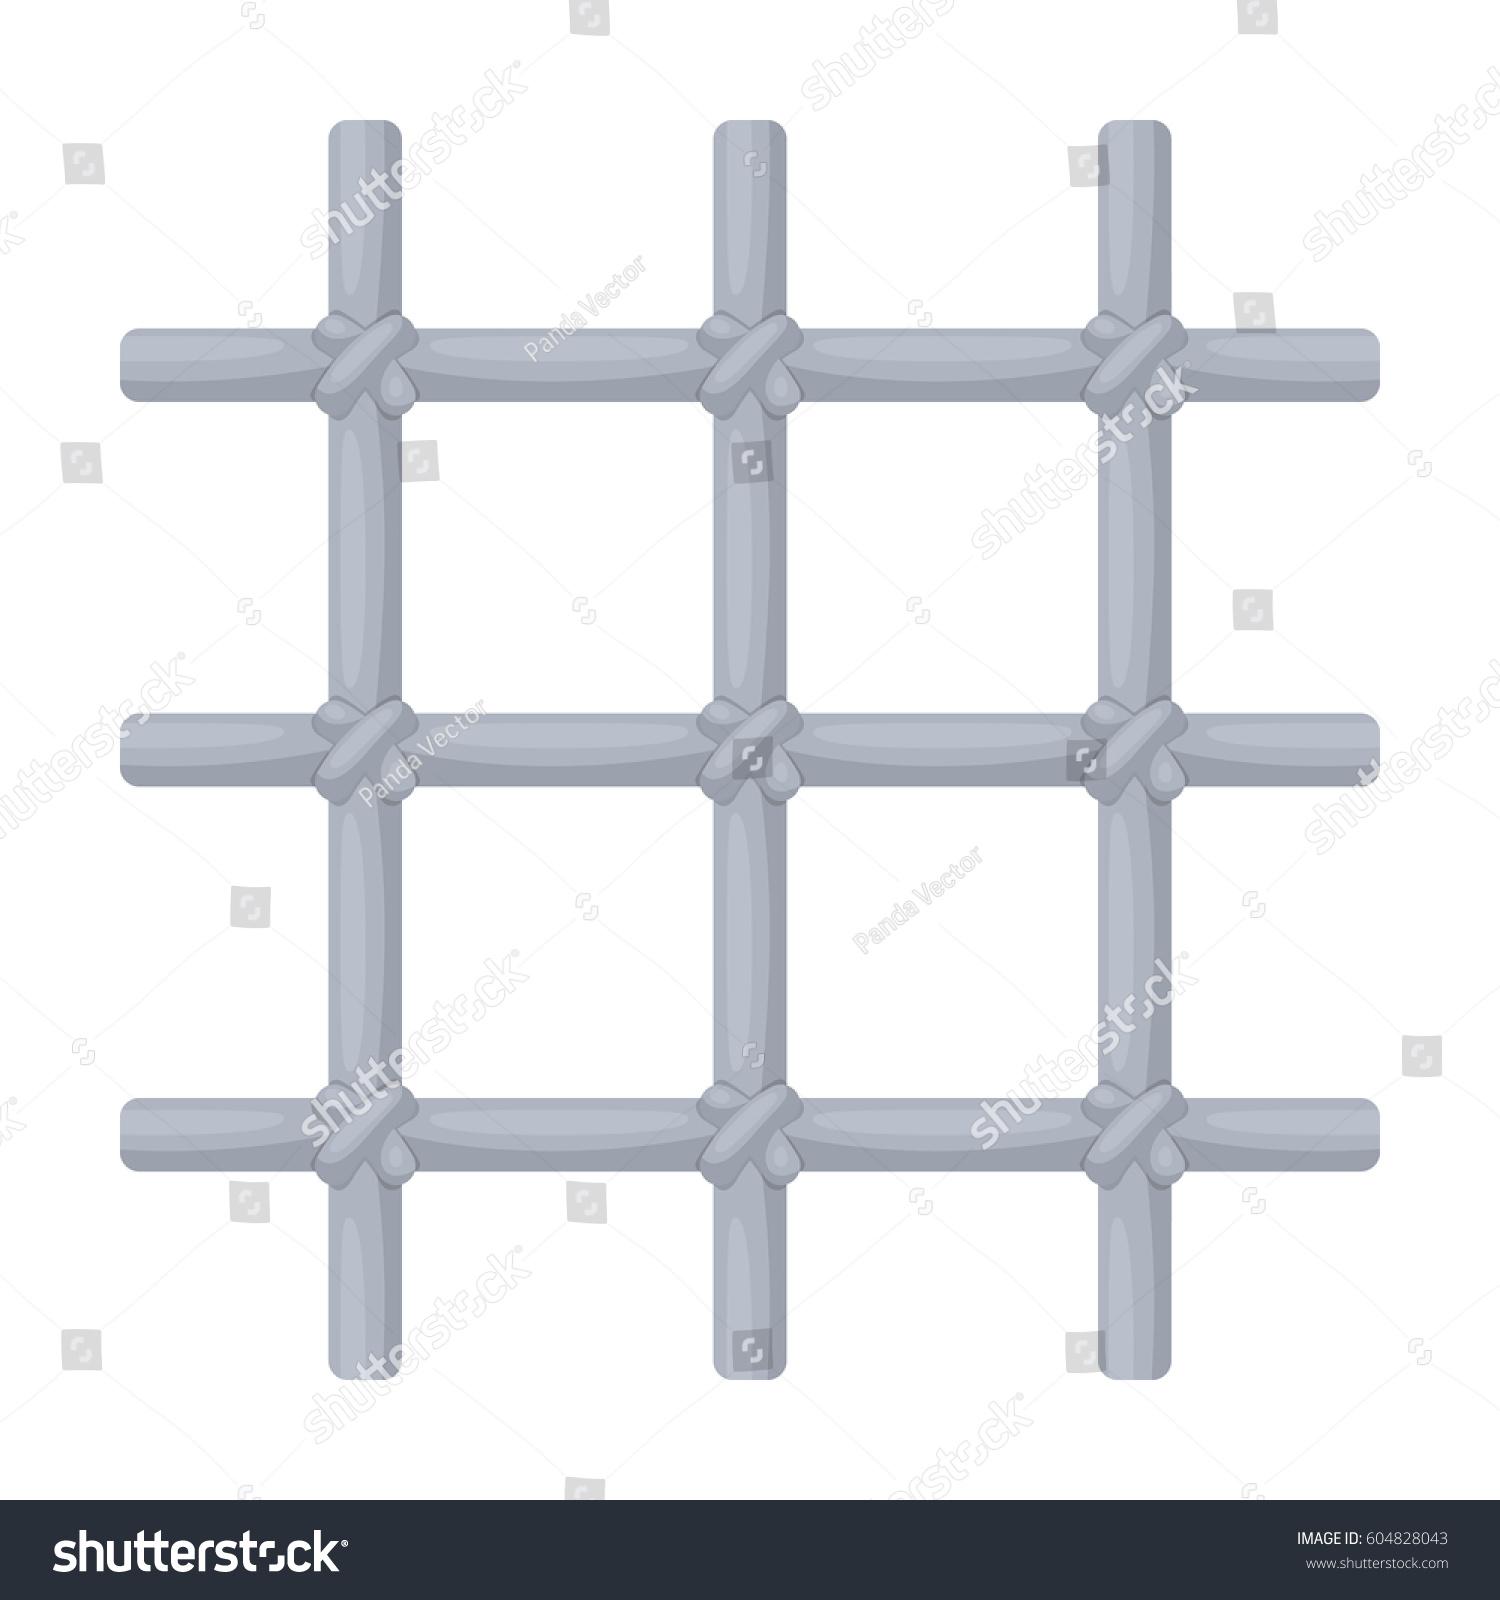 Lattice cell prisoner metal door hold stock vector 604828043 lattice in the cell of the prisoner a metal door to hold criminalsison buycottarizona Gallery